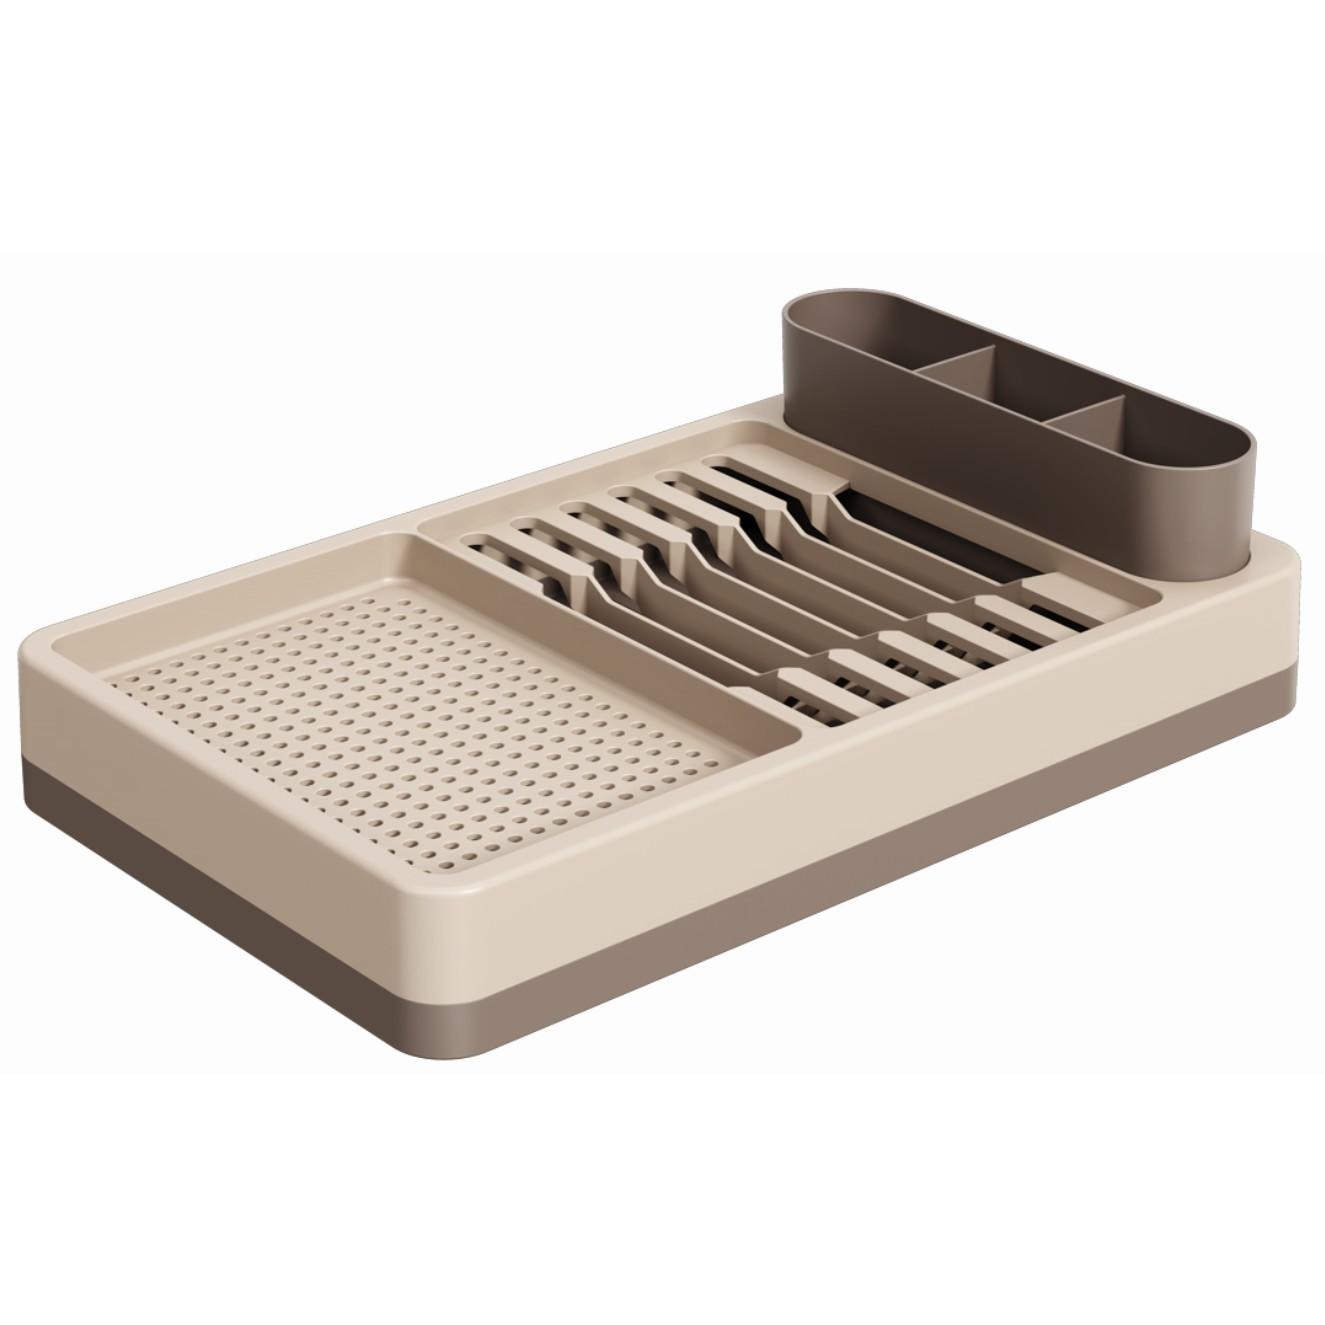 Escorredor de Prato de Plastico Warm Gray 17000 - Coza